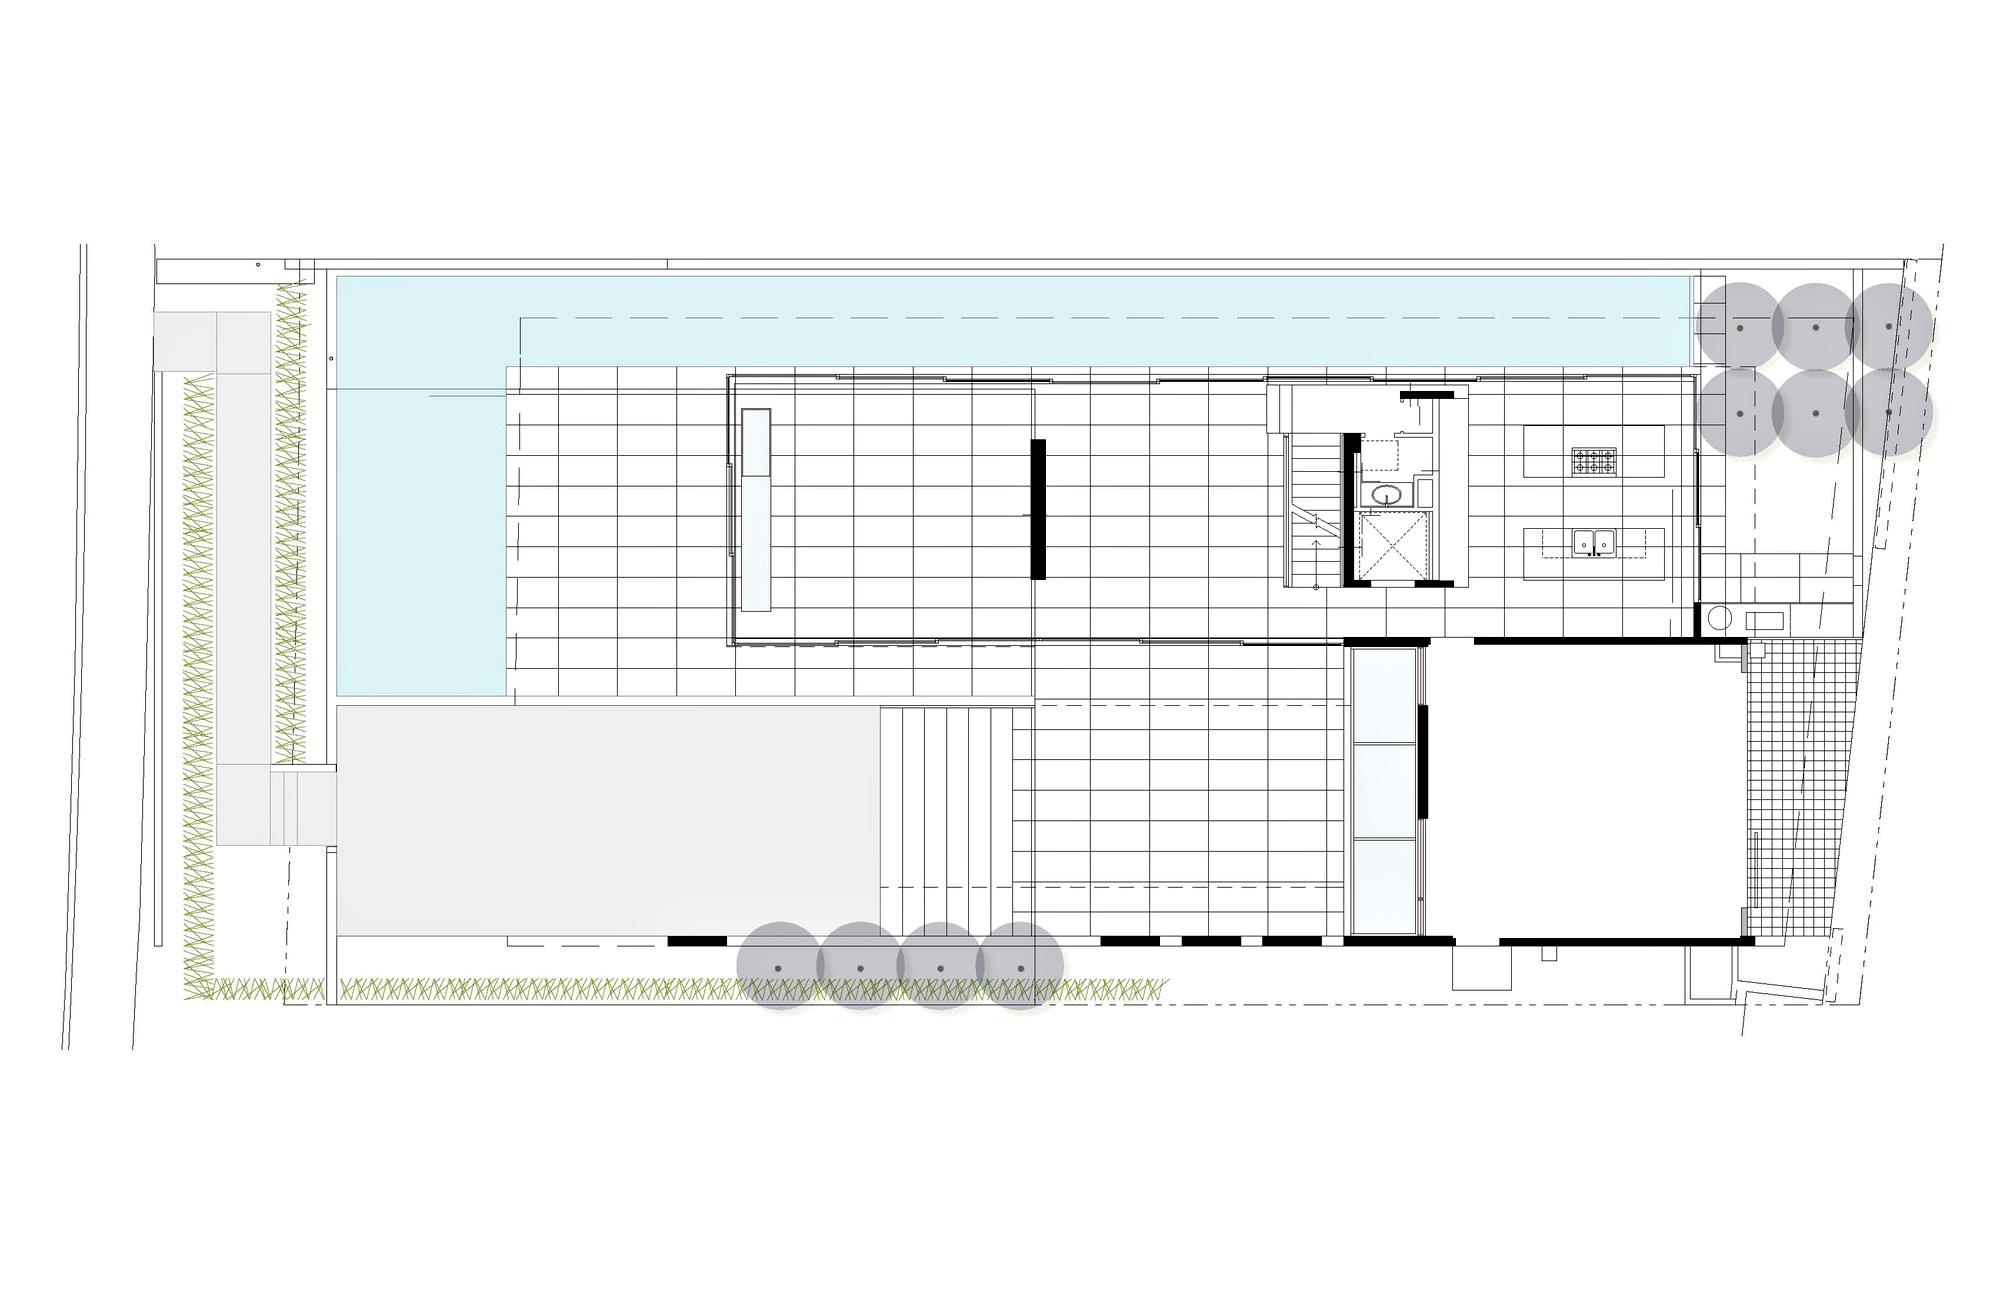 Floor Plans - The Cresta Luxury Residence - La Jolla, San Diego, CA, USA